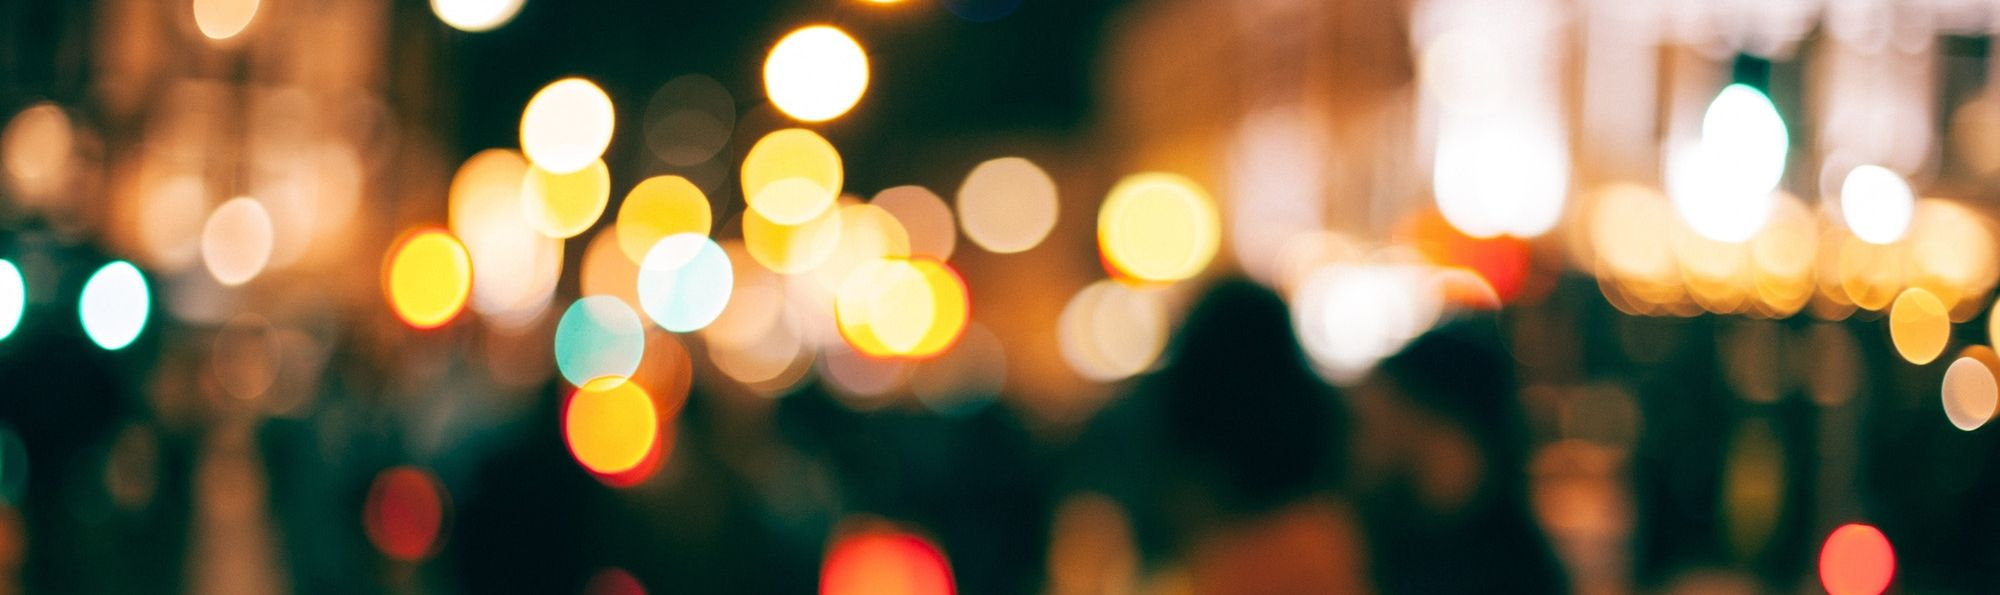 Some blurred lights